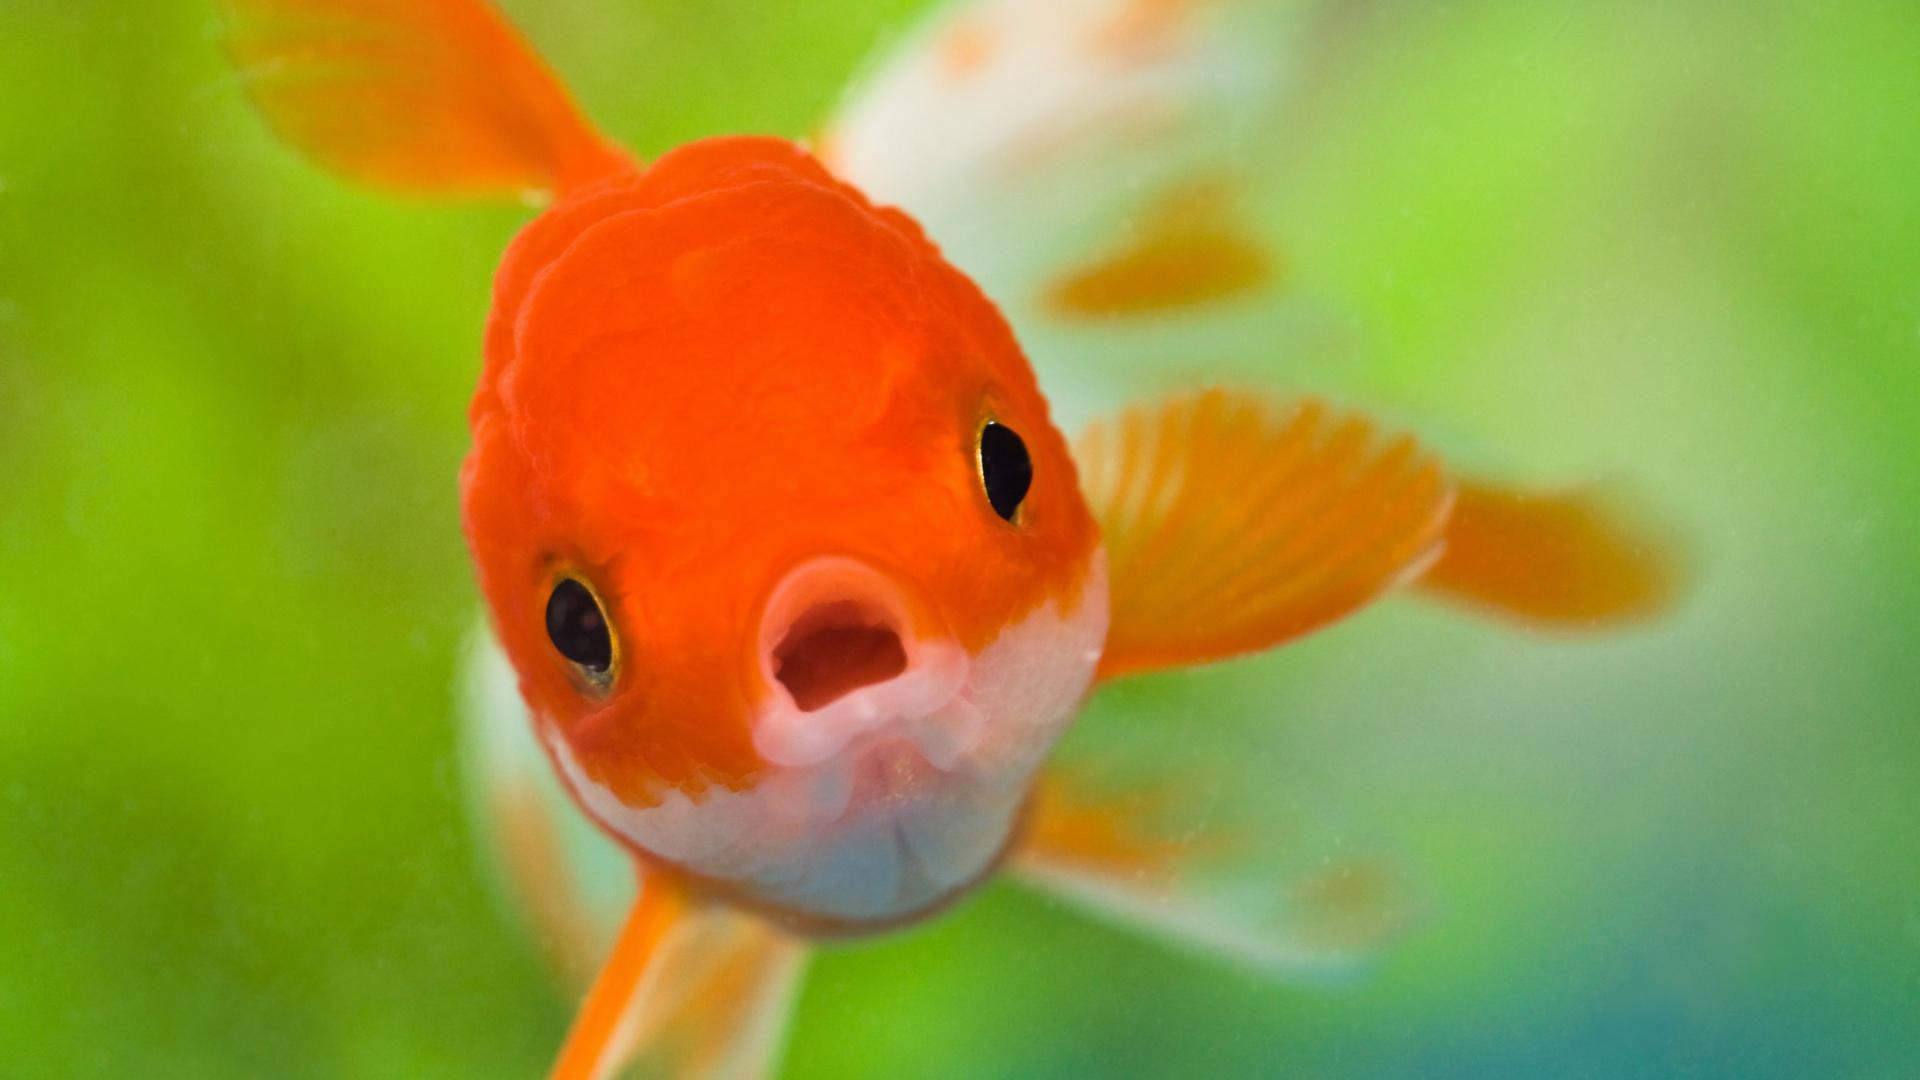 hd pics photos fish cute gold fish desktop background wallpaper